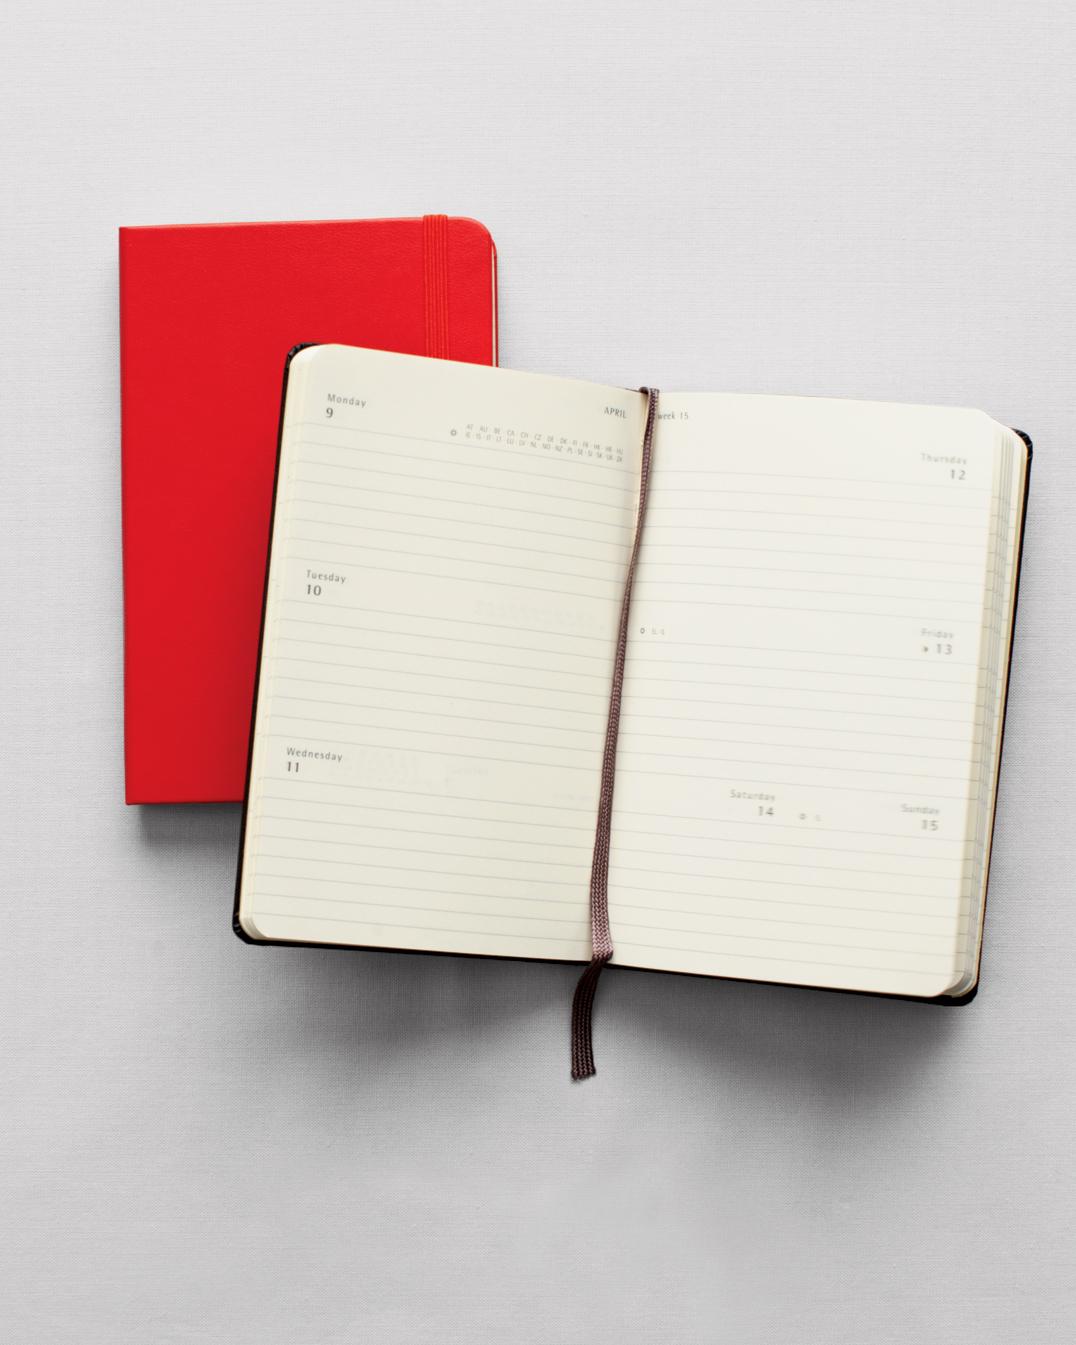 paper-planner-gt-mwd107748.jpg